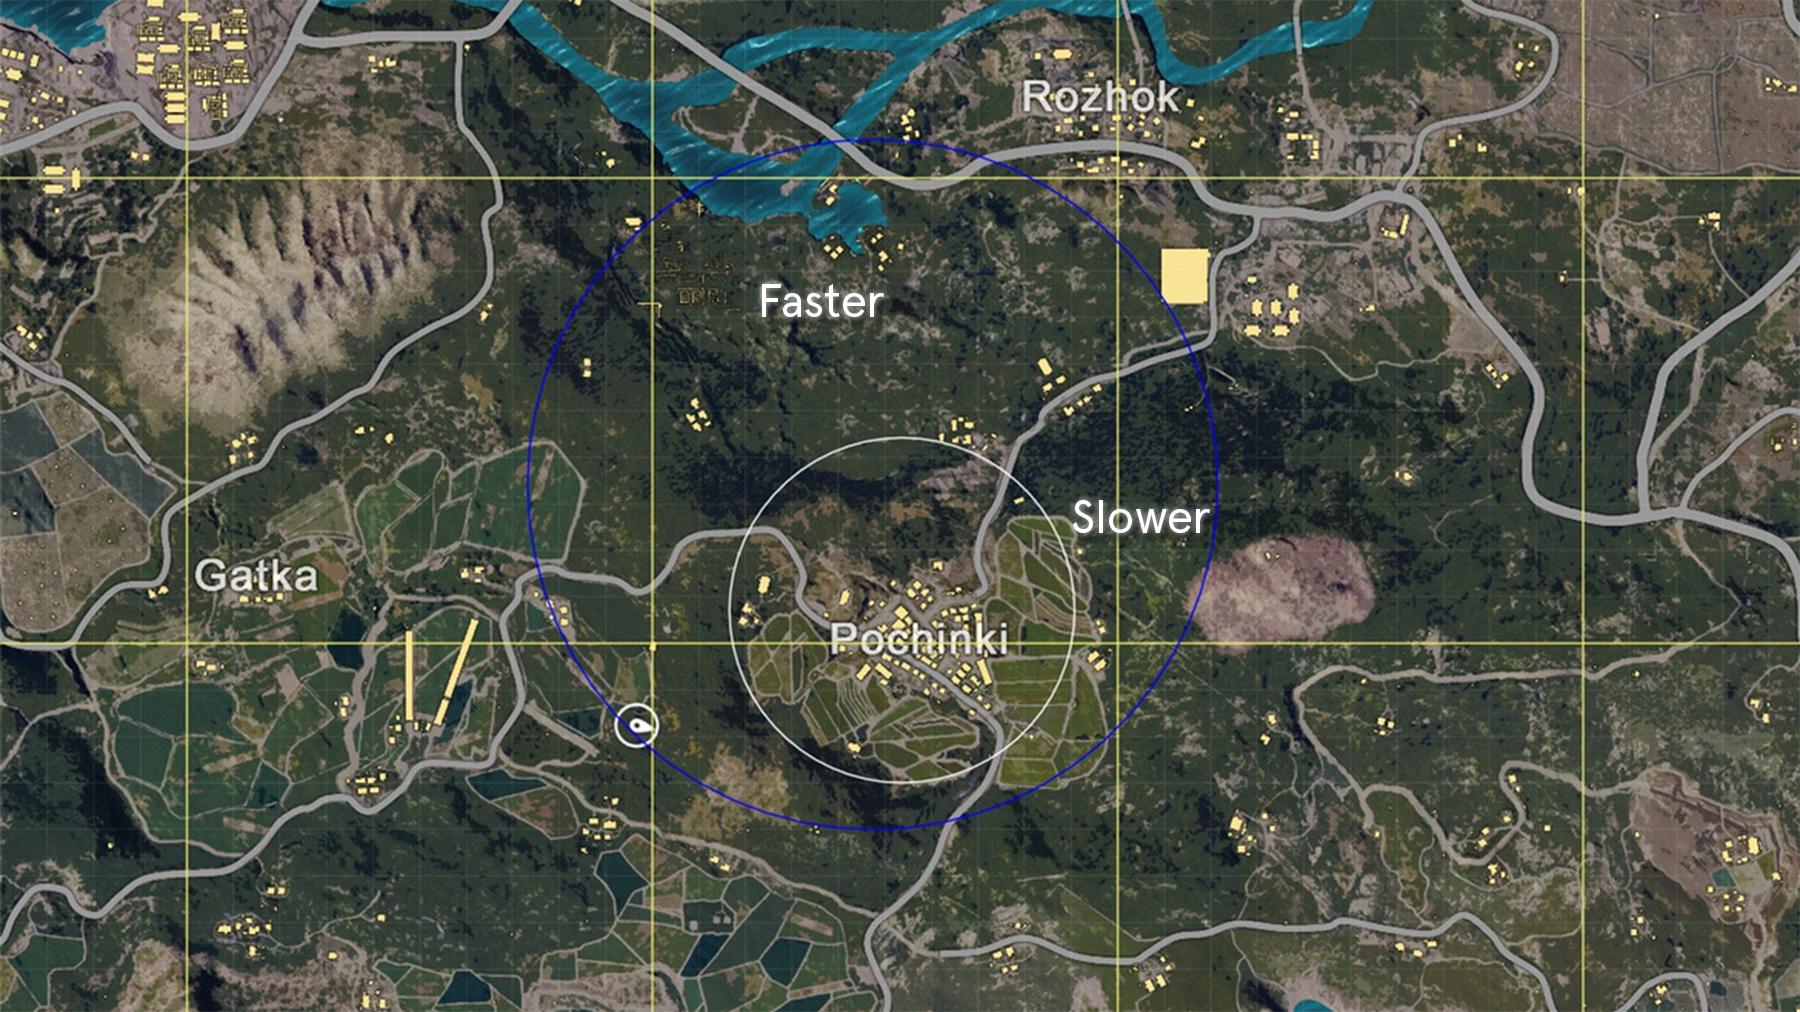 Playerunknown S Battlegrounds Map Locations: 10 Essential Tips For Playerunknown's Battlegrounds